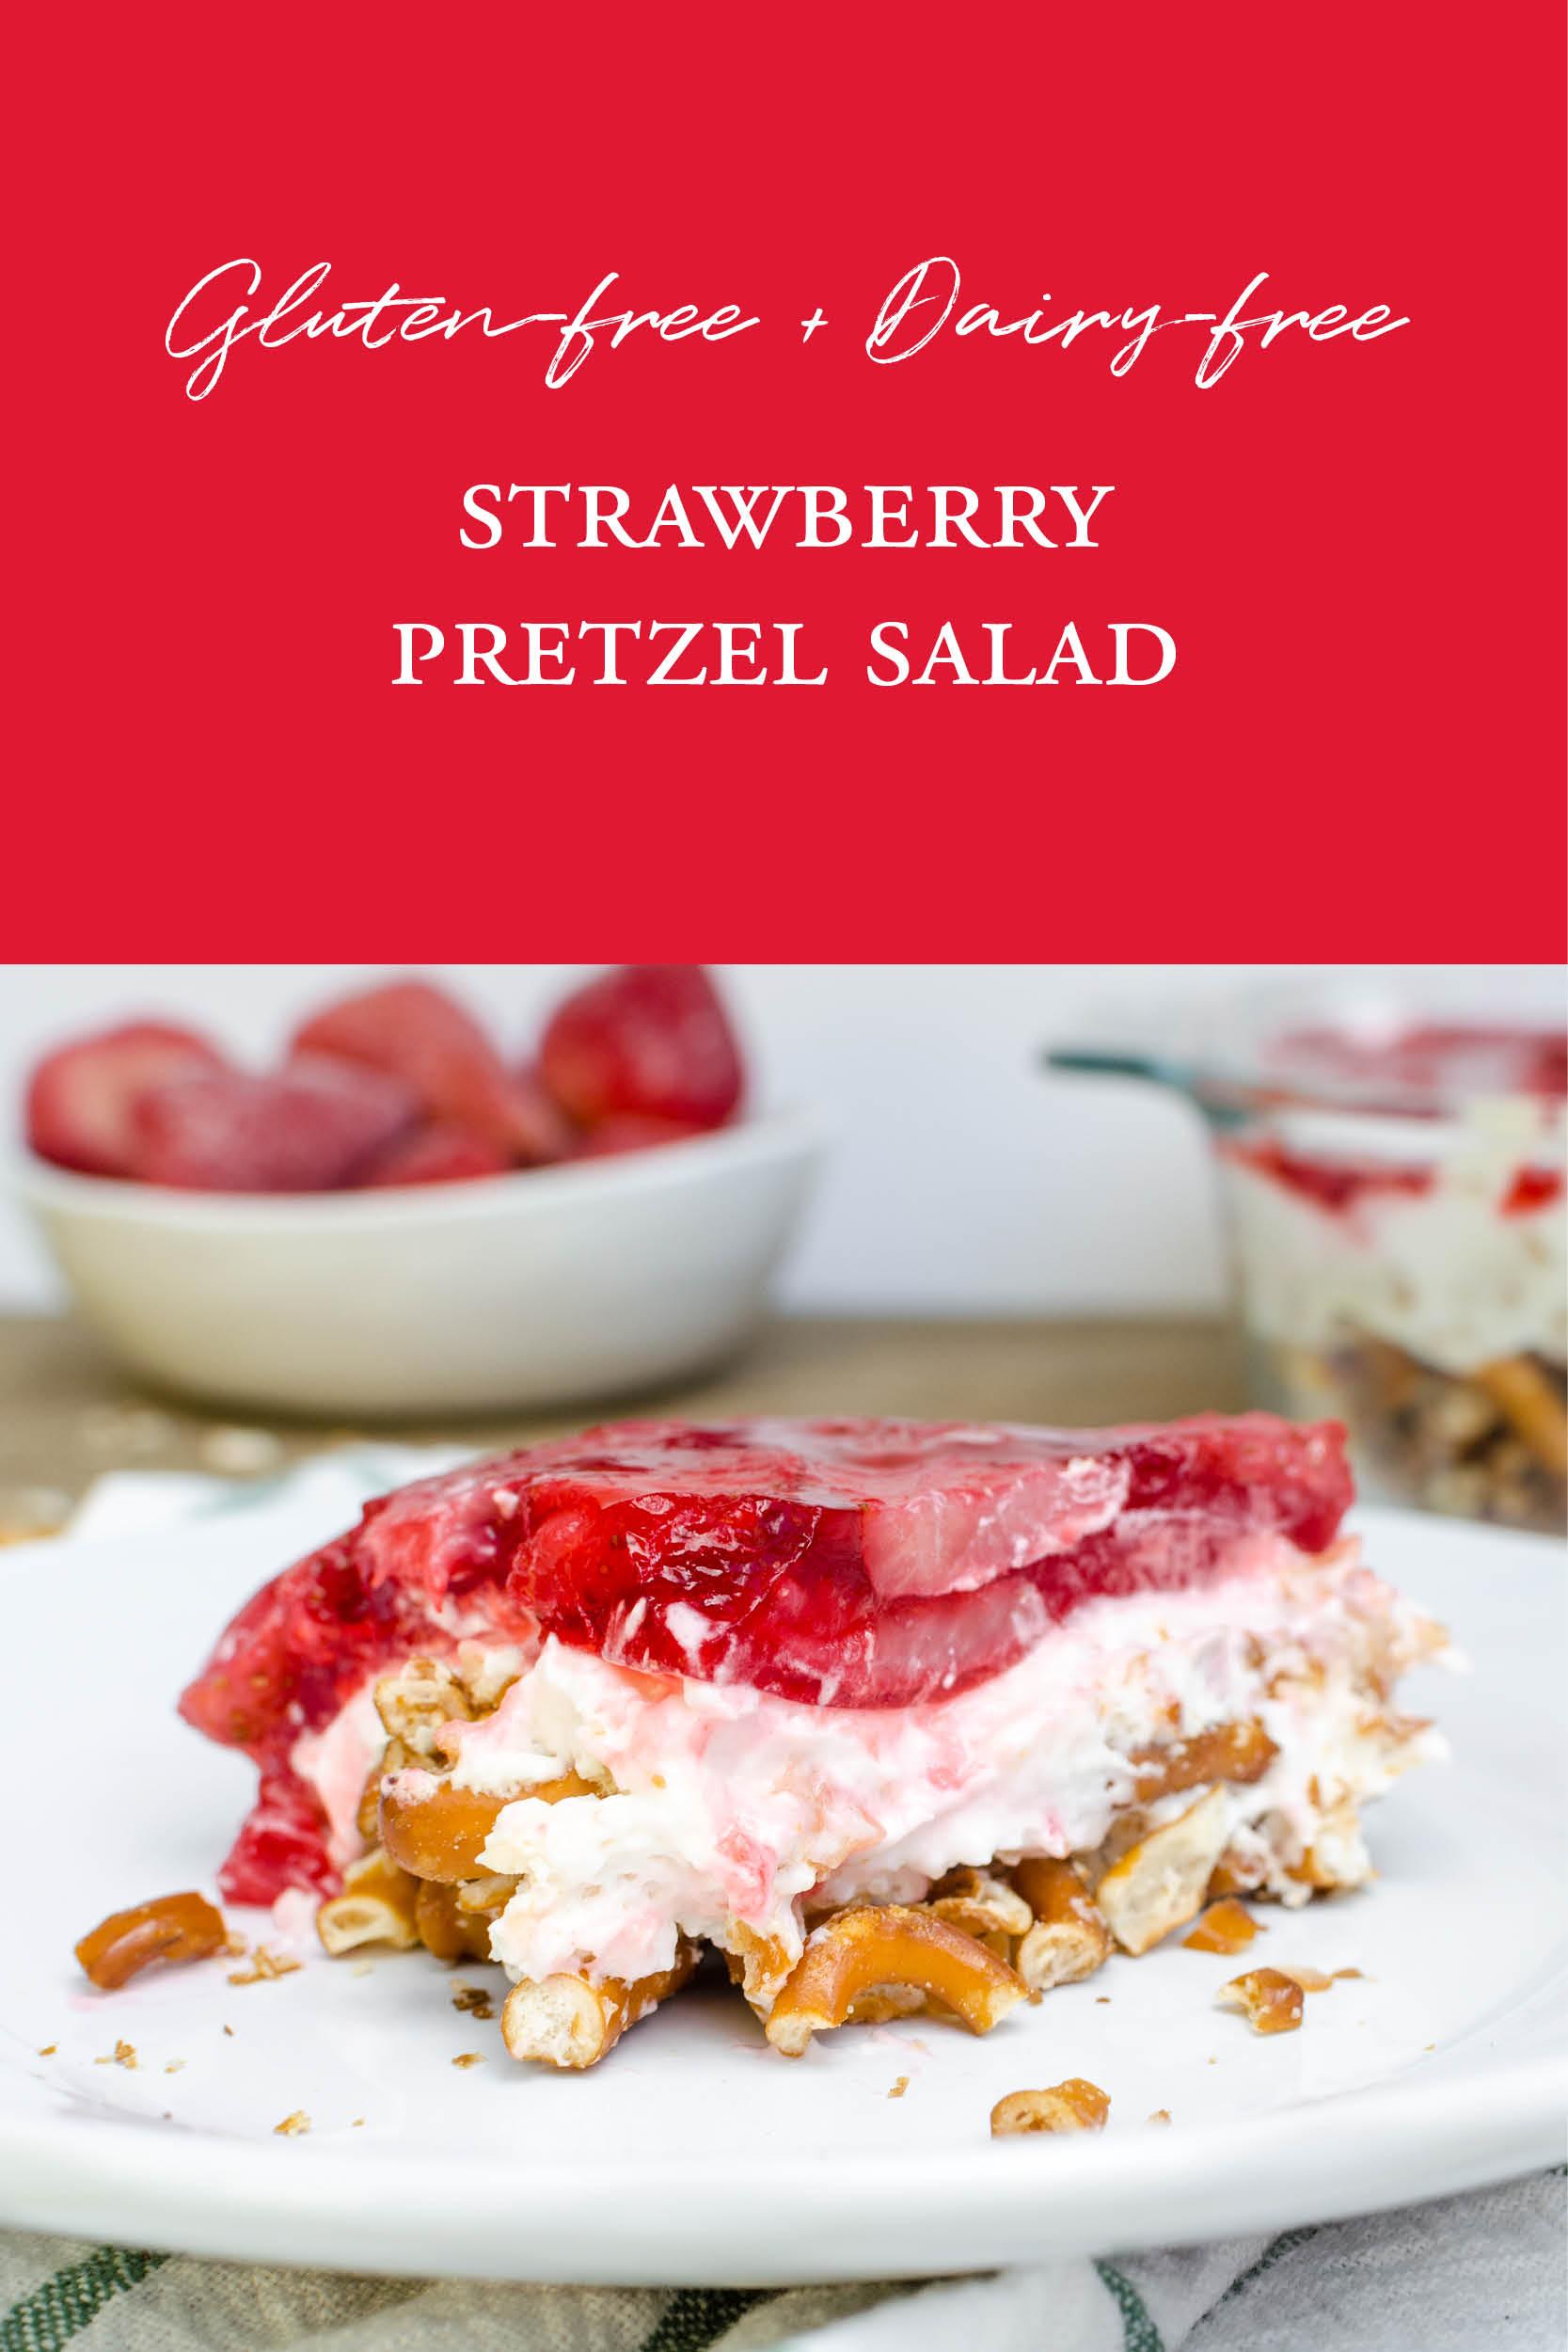 Studioist_Pinterest Design_Pretzel Salad5.jpg